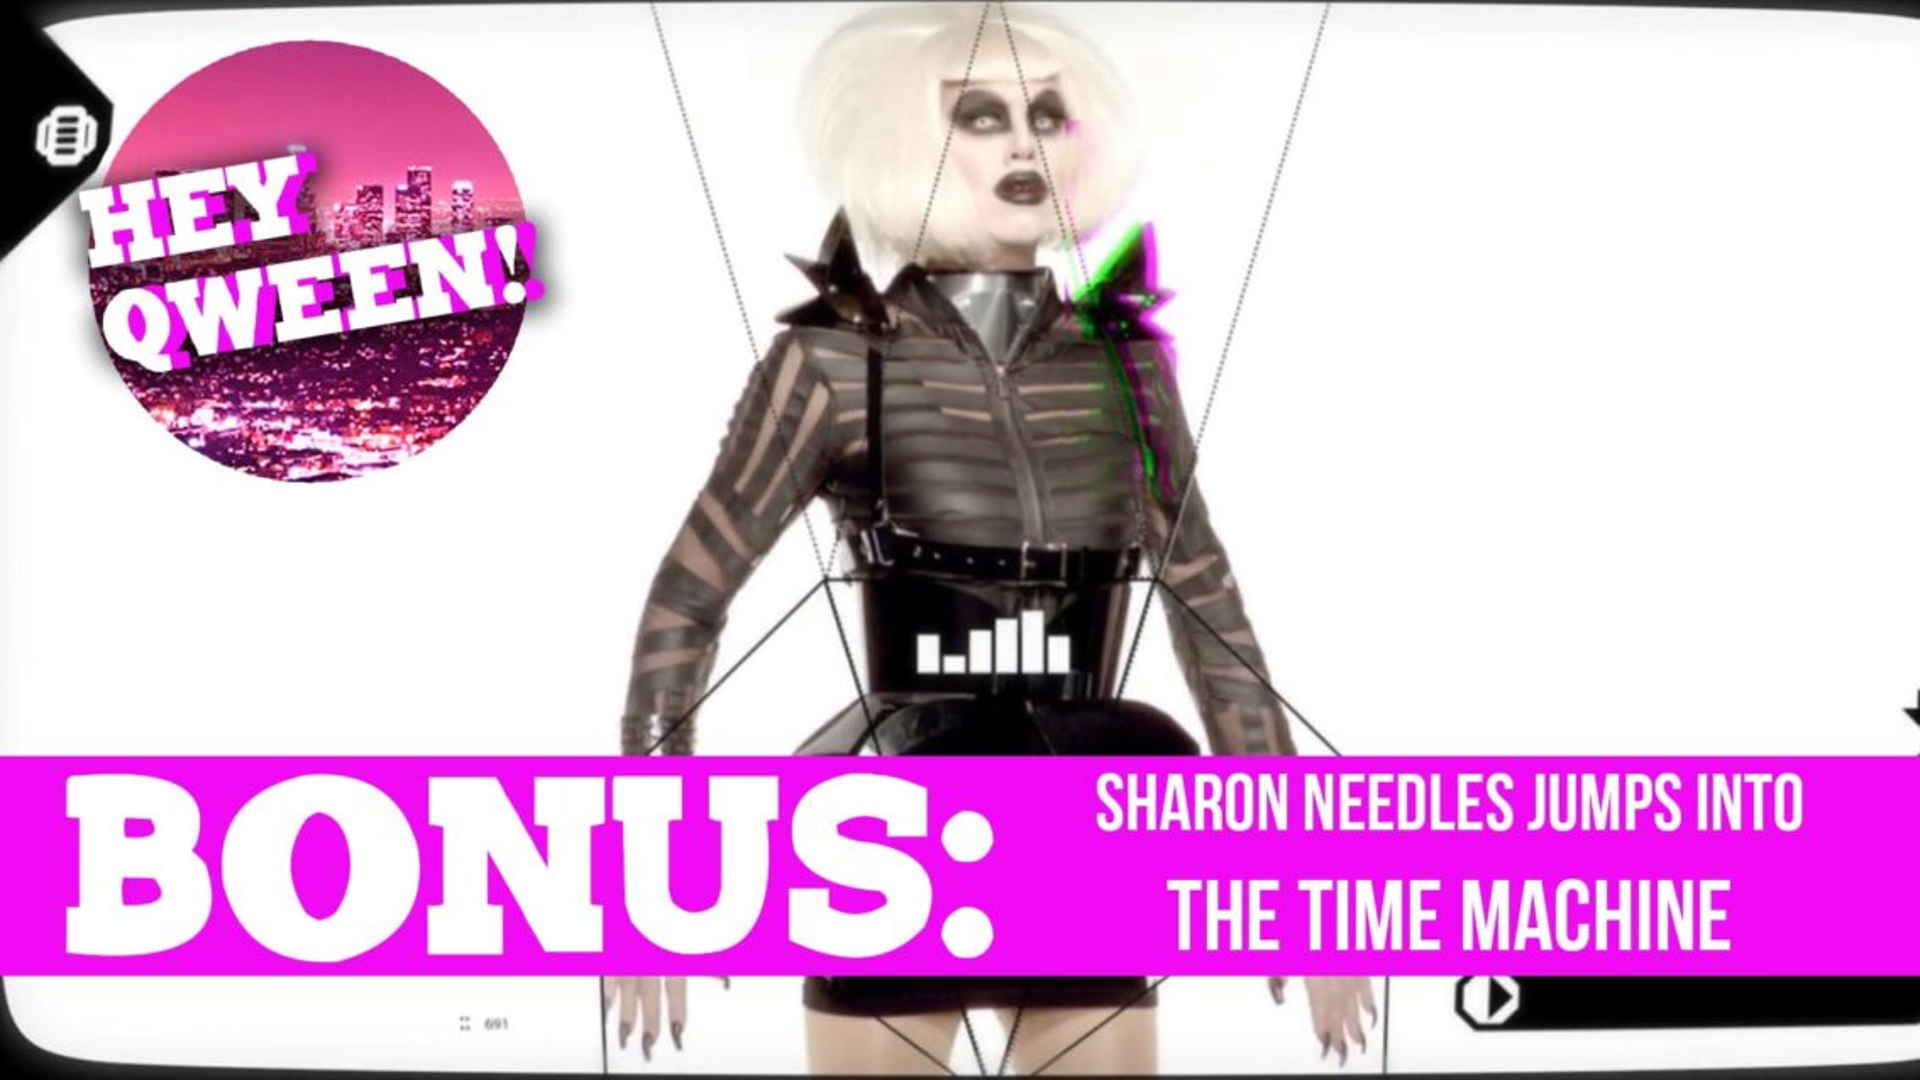 Hey Qween! BONUS: Sharon Needles' Jumps Into The Time Machine